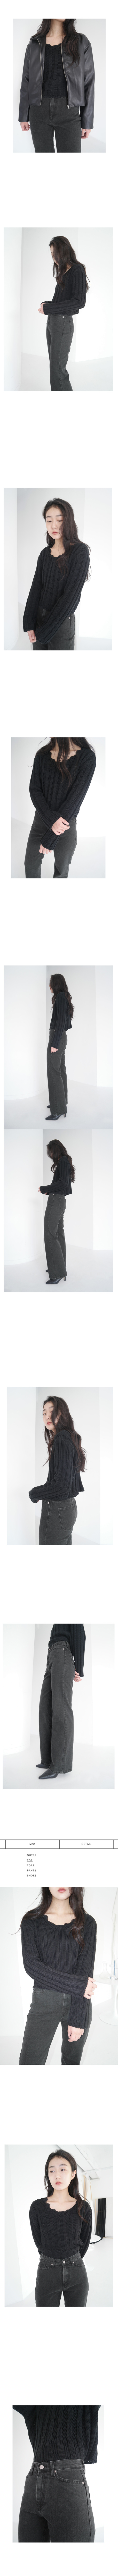 various straight denim pants